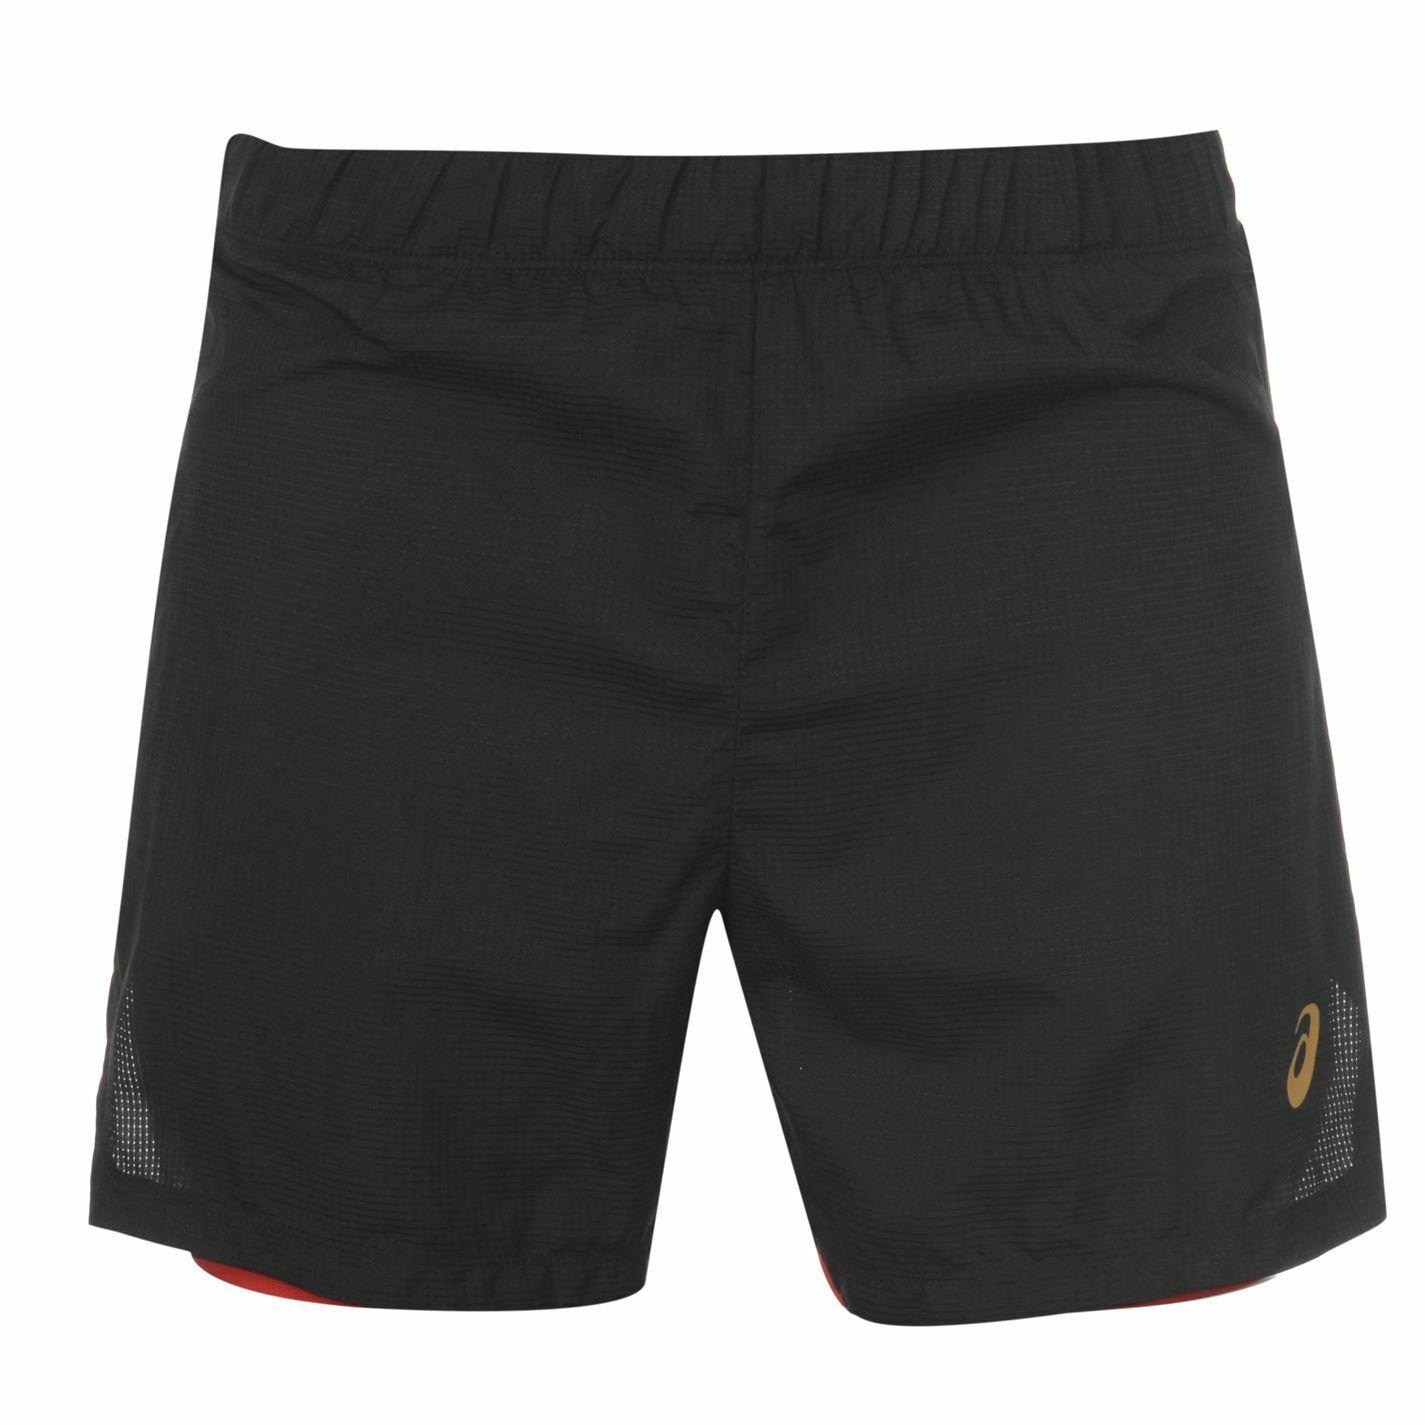 Asics Cool 2IN1 Sht para hombre Pantalones cortos de rendimiento Caballeros Pantalones Pantalones